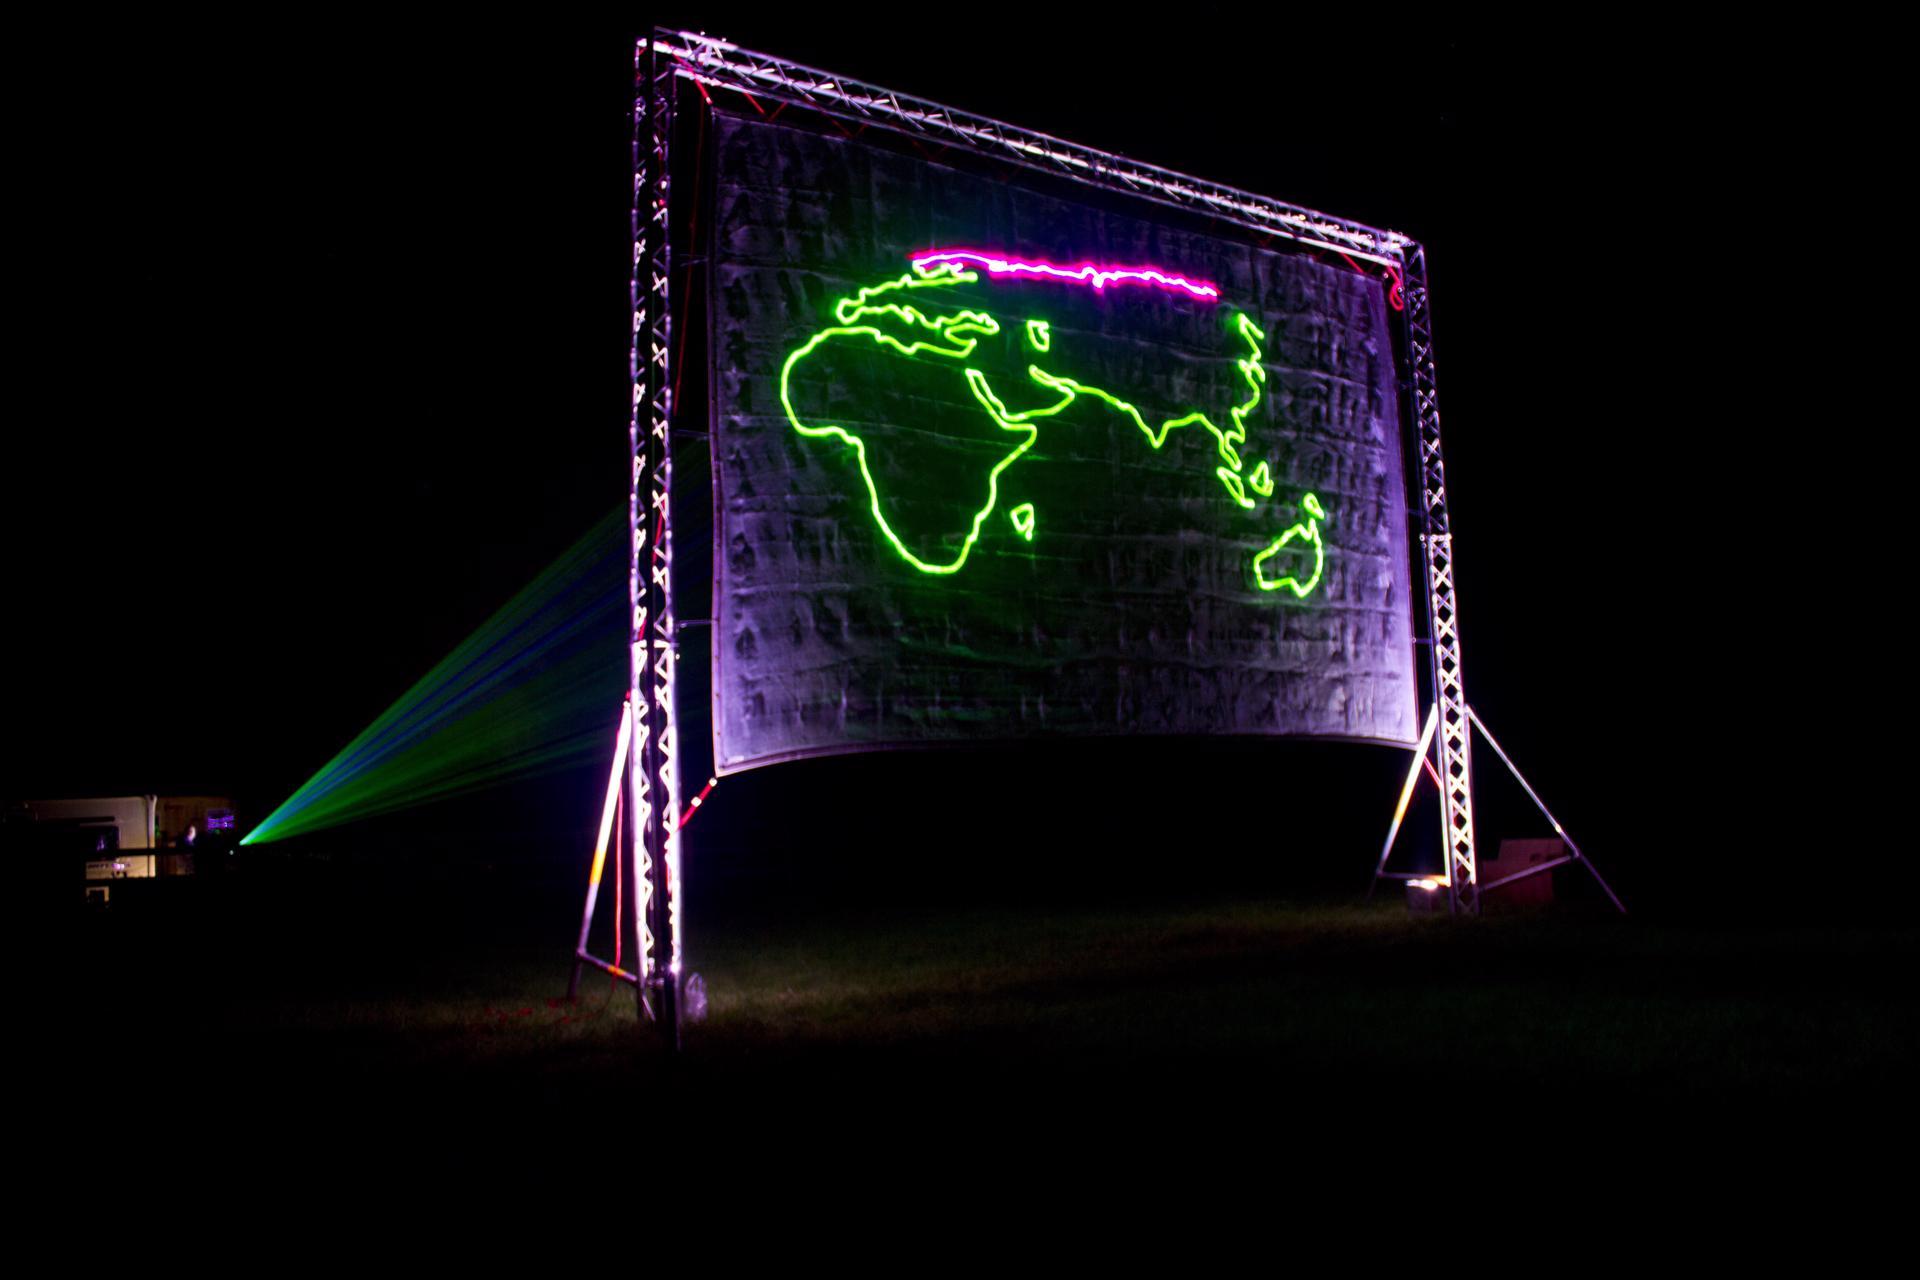 5m-high-laser-screen_21984674552_o-1920x1280.jpg